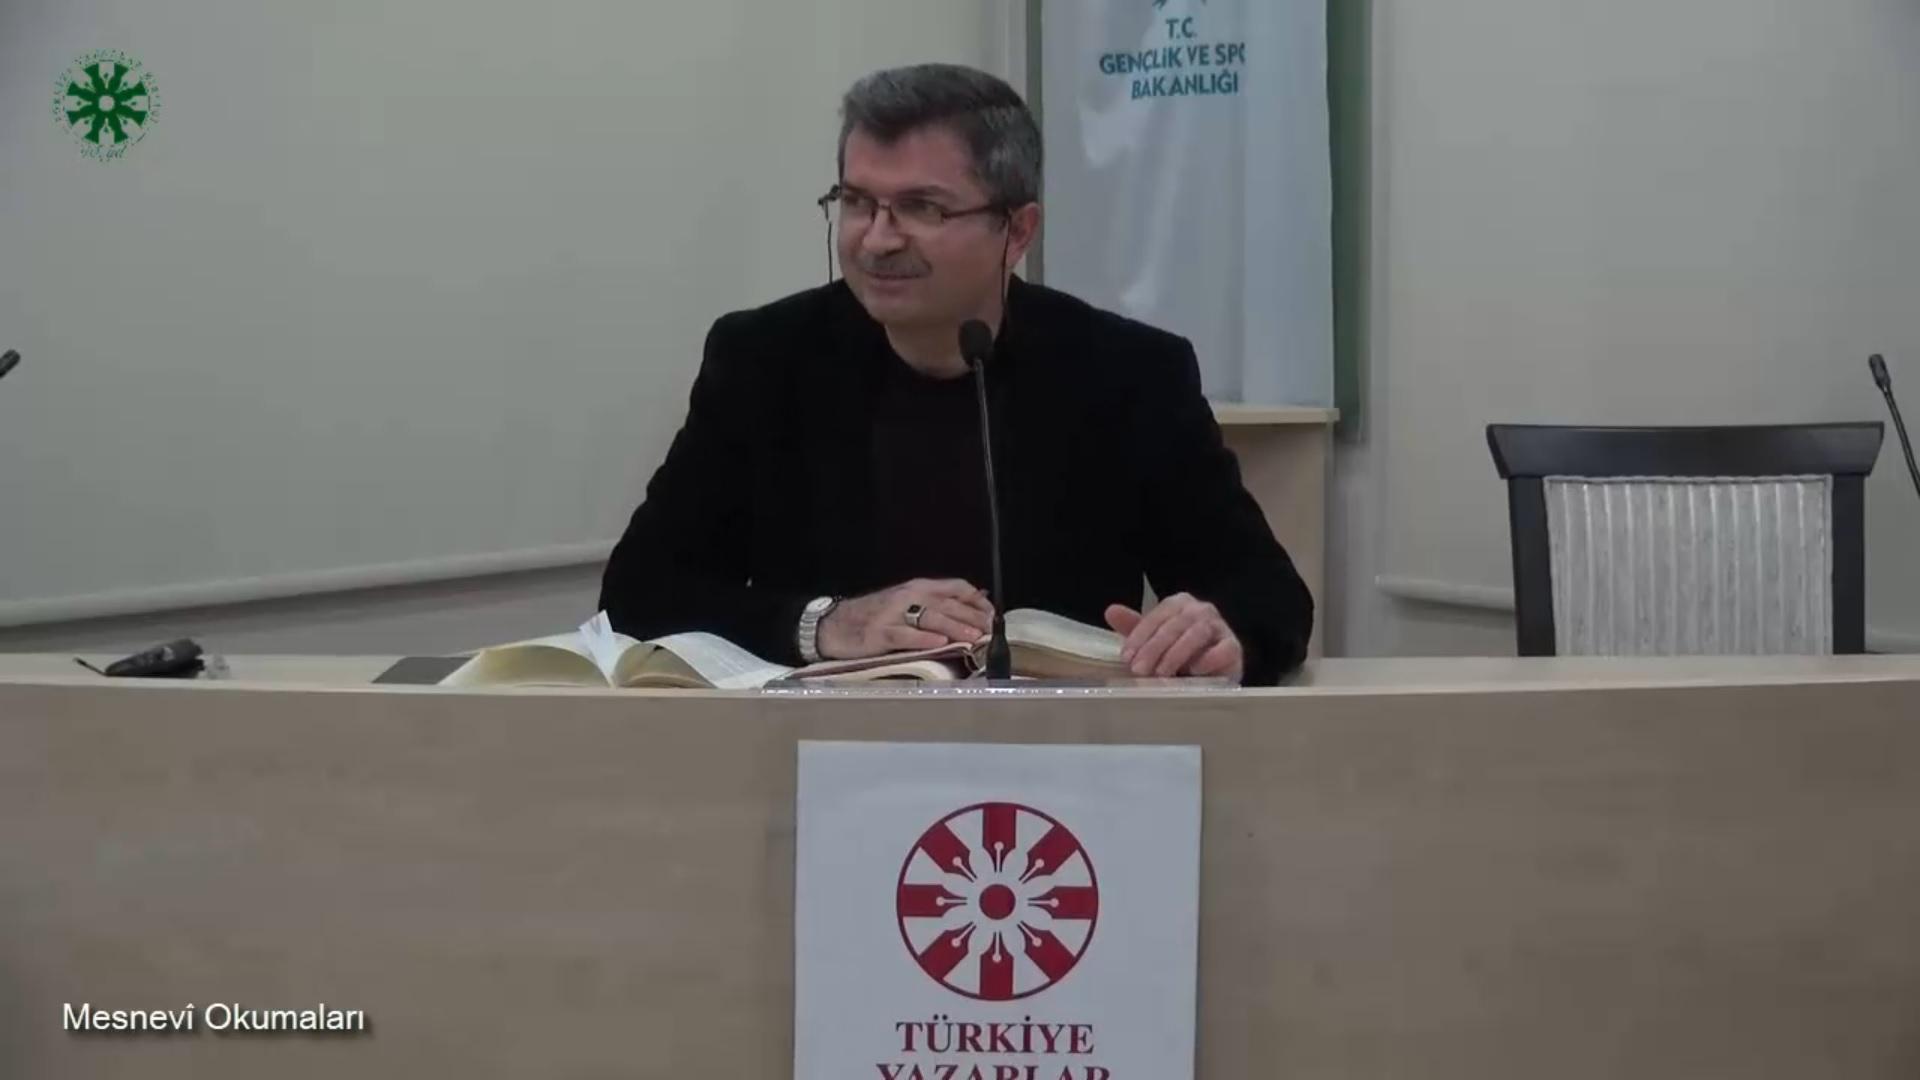 Mesnevî Okumaları -46- Dr. Fahrettin Coşguner